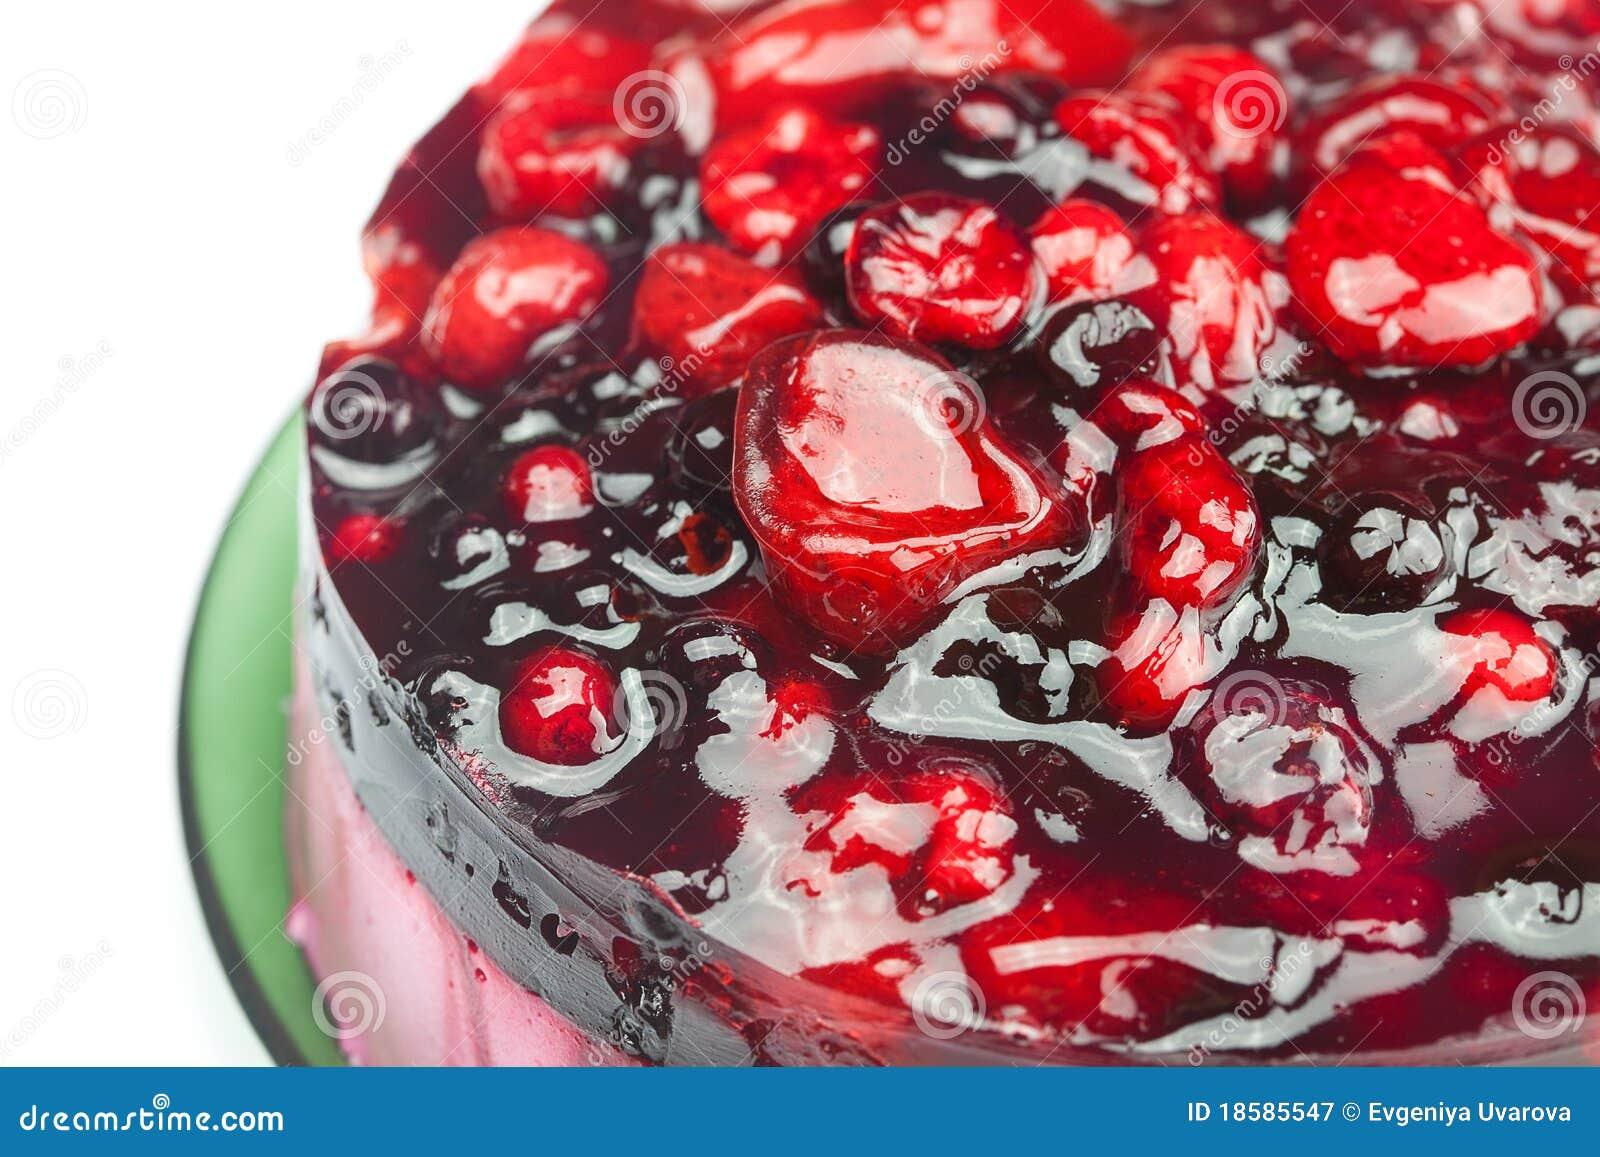 Free Beautiful Cake Images : Beautiful Cake With Berries Stock Image - Image: 18585547